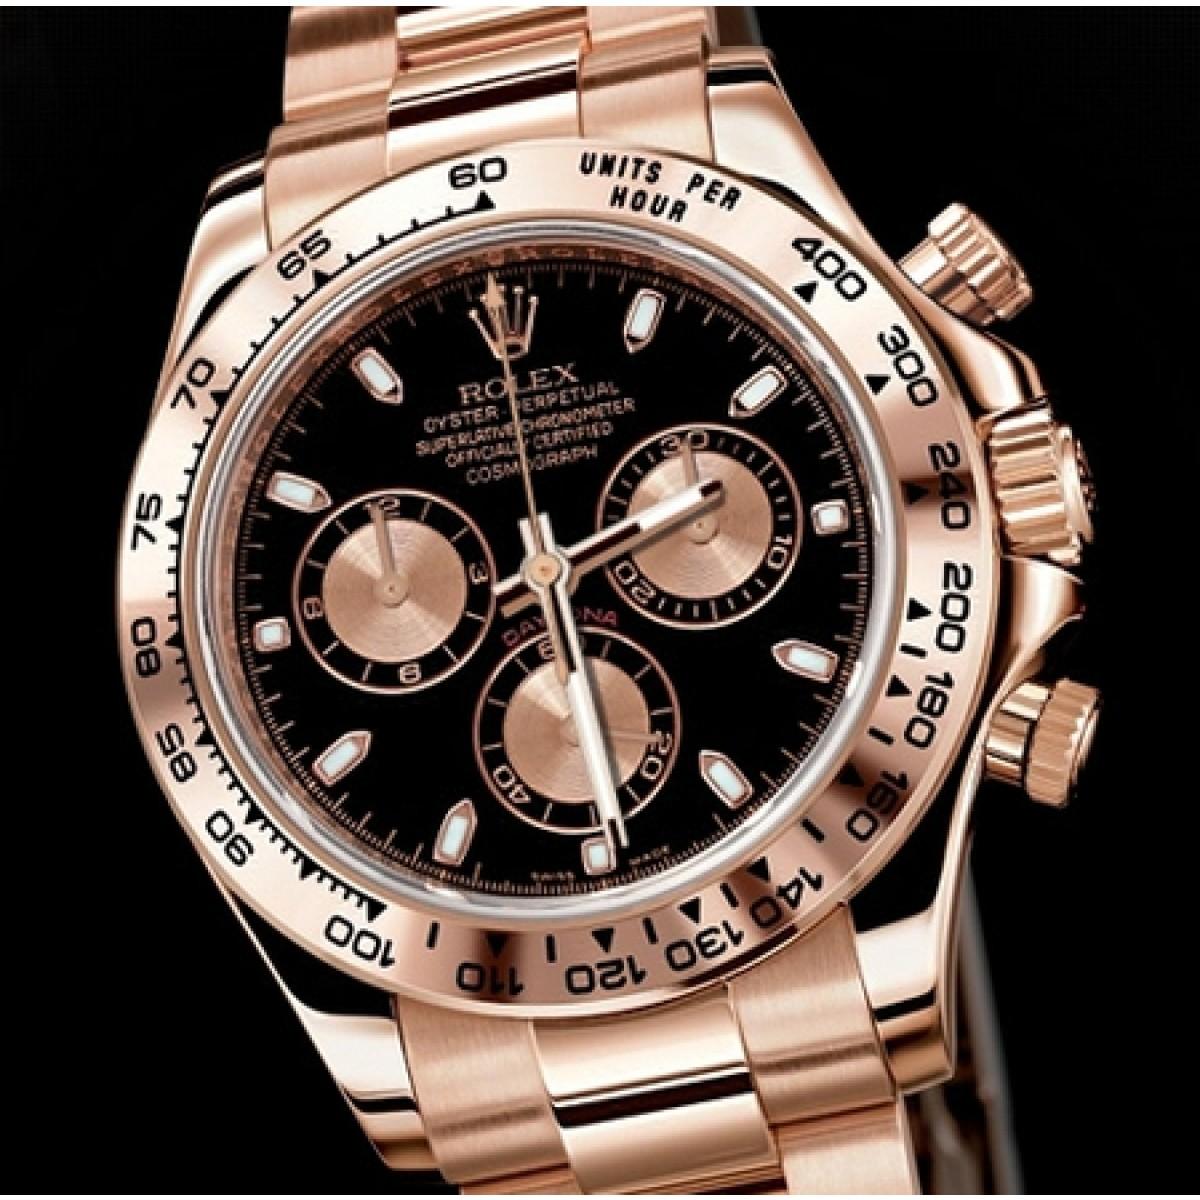 6c6735547f0 Relógio Réplica Rolex Oyster Perpetual Black Gold